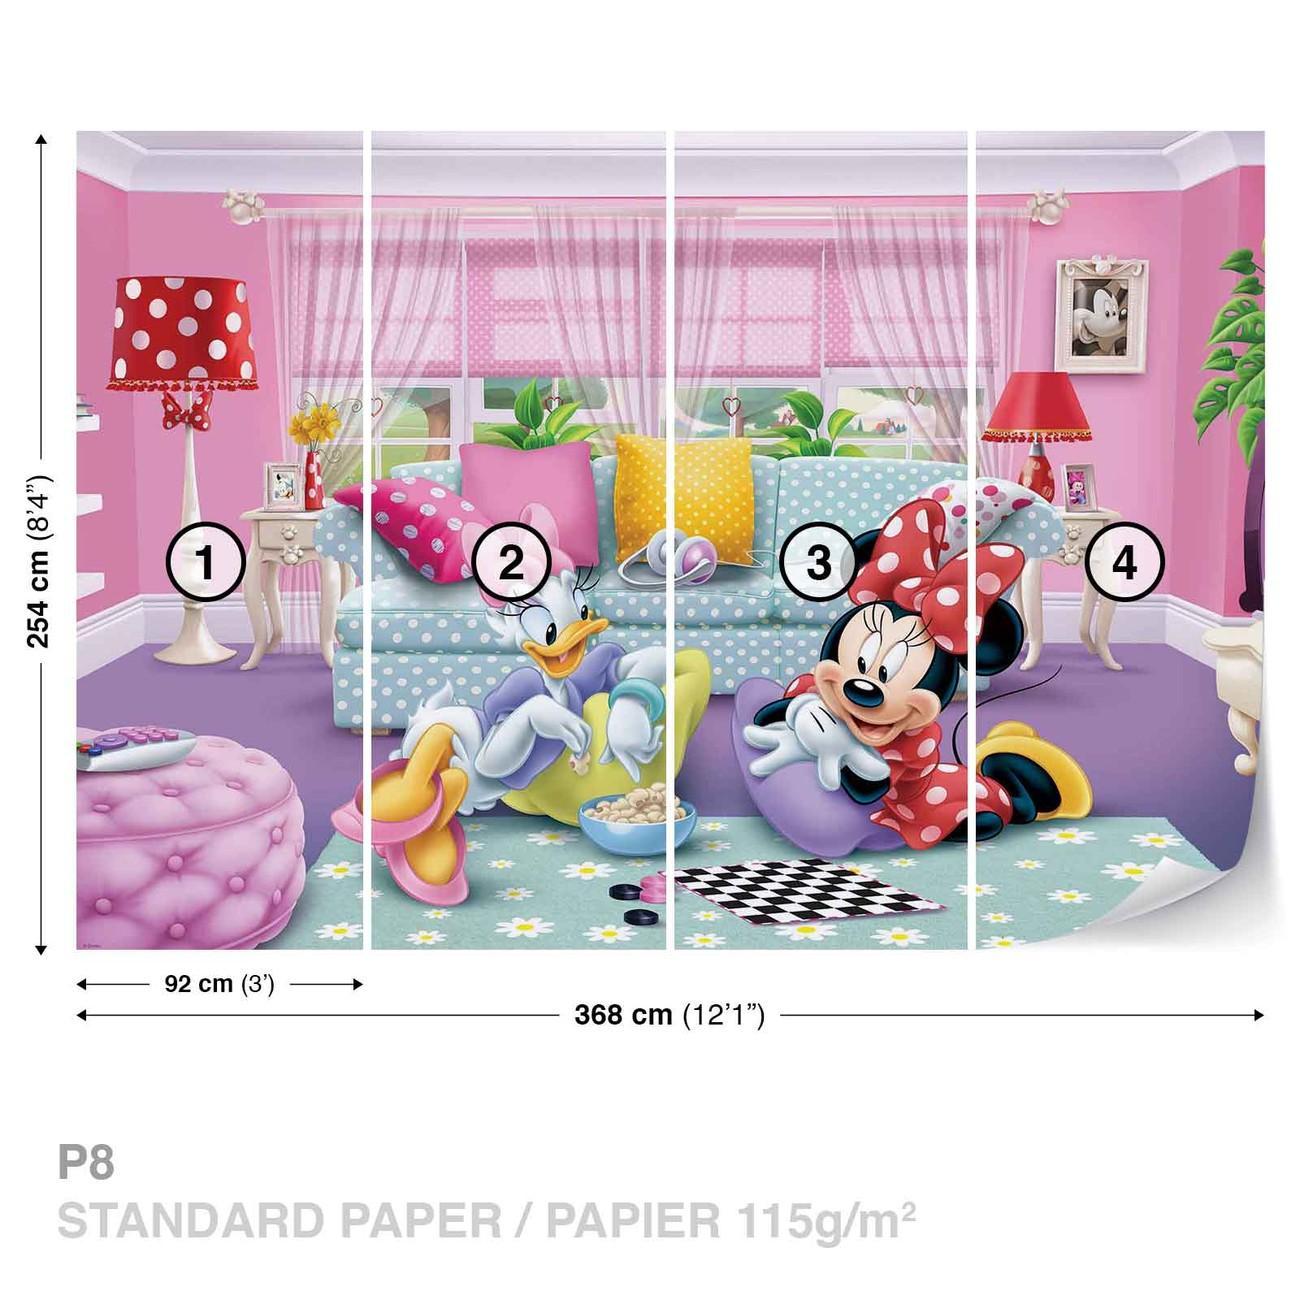 81a402508 Murais de parede Disney Minnie Mouse em Europosters.pt